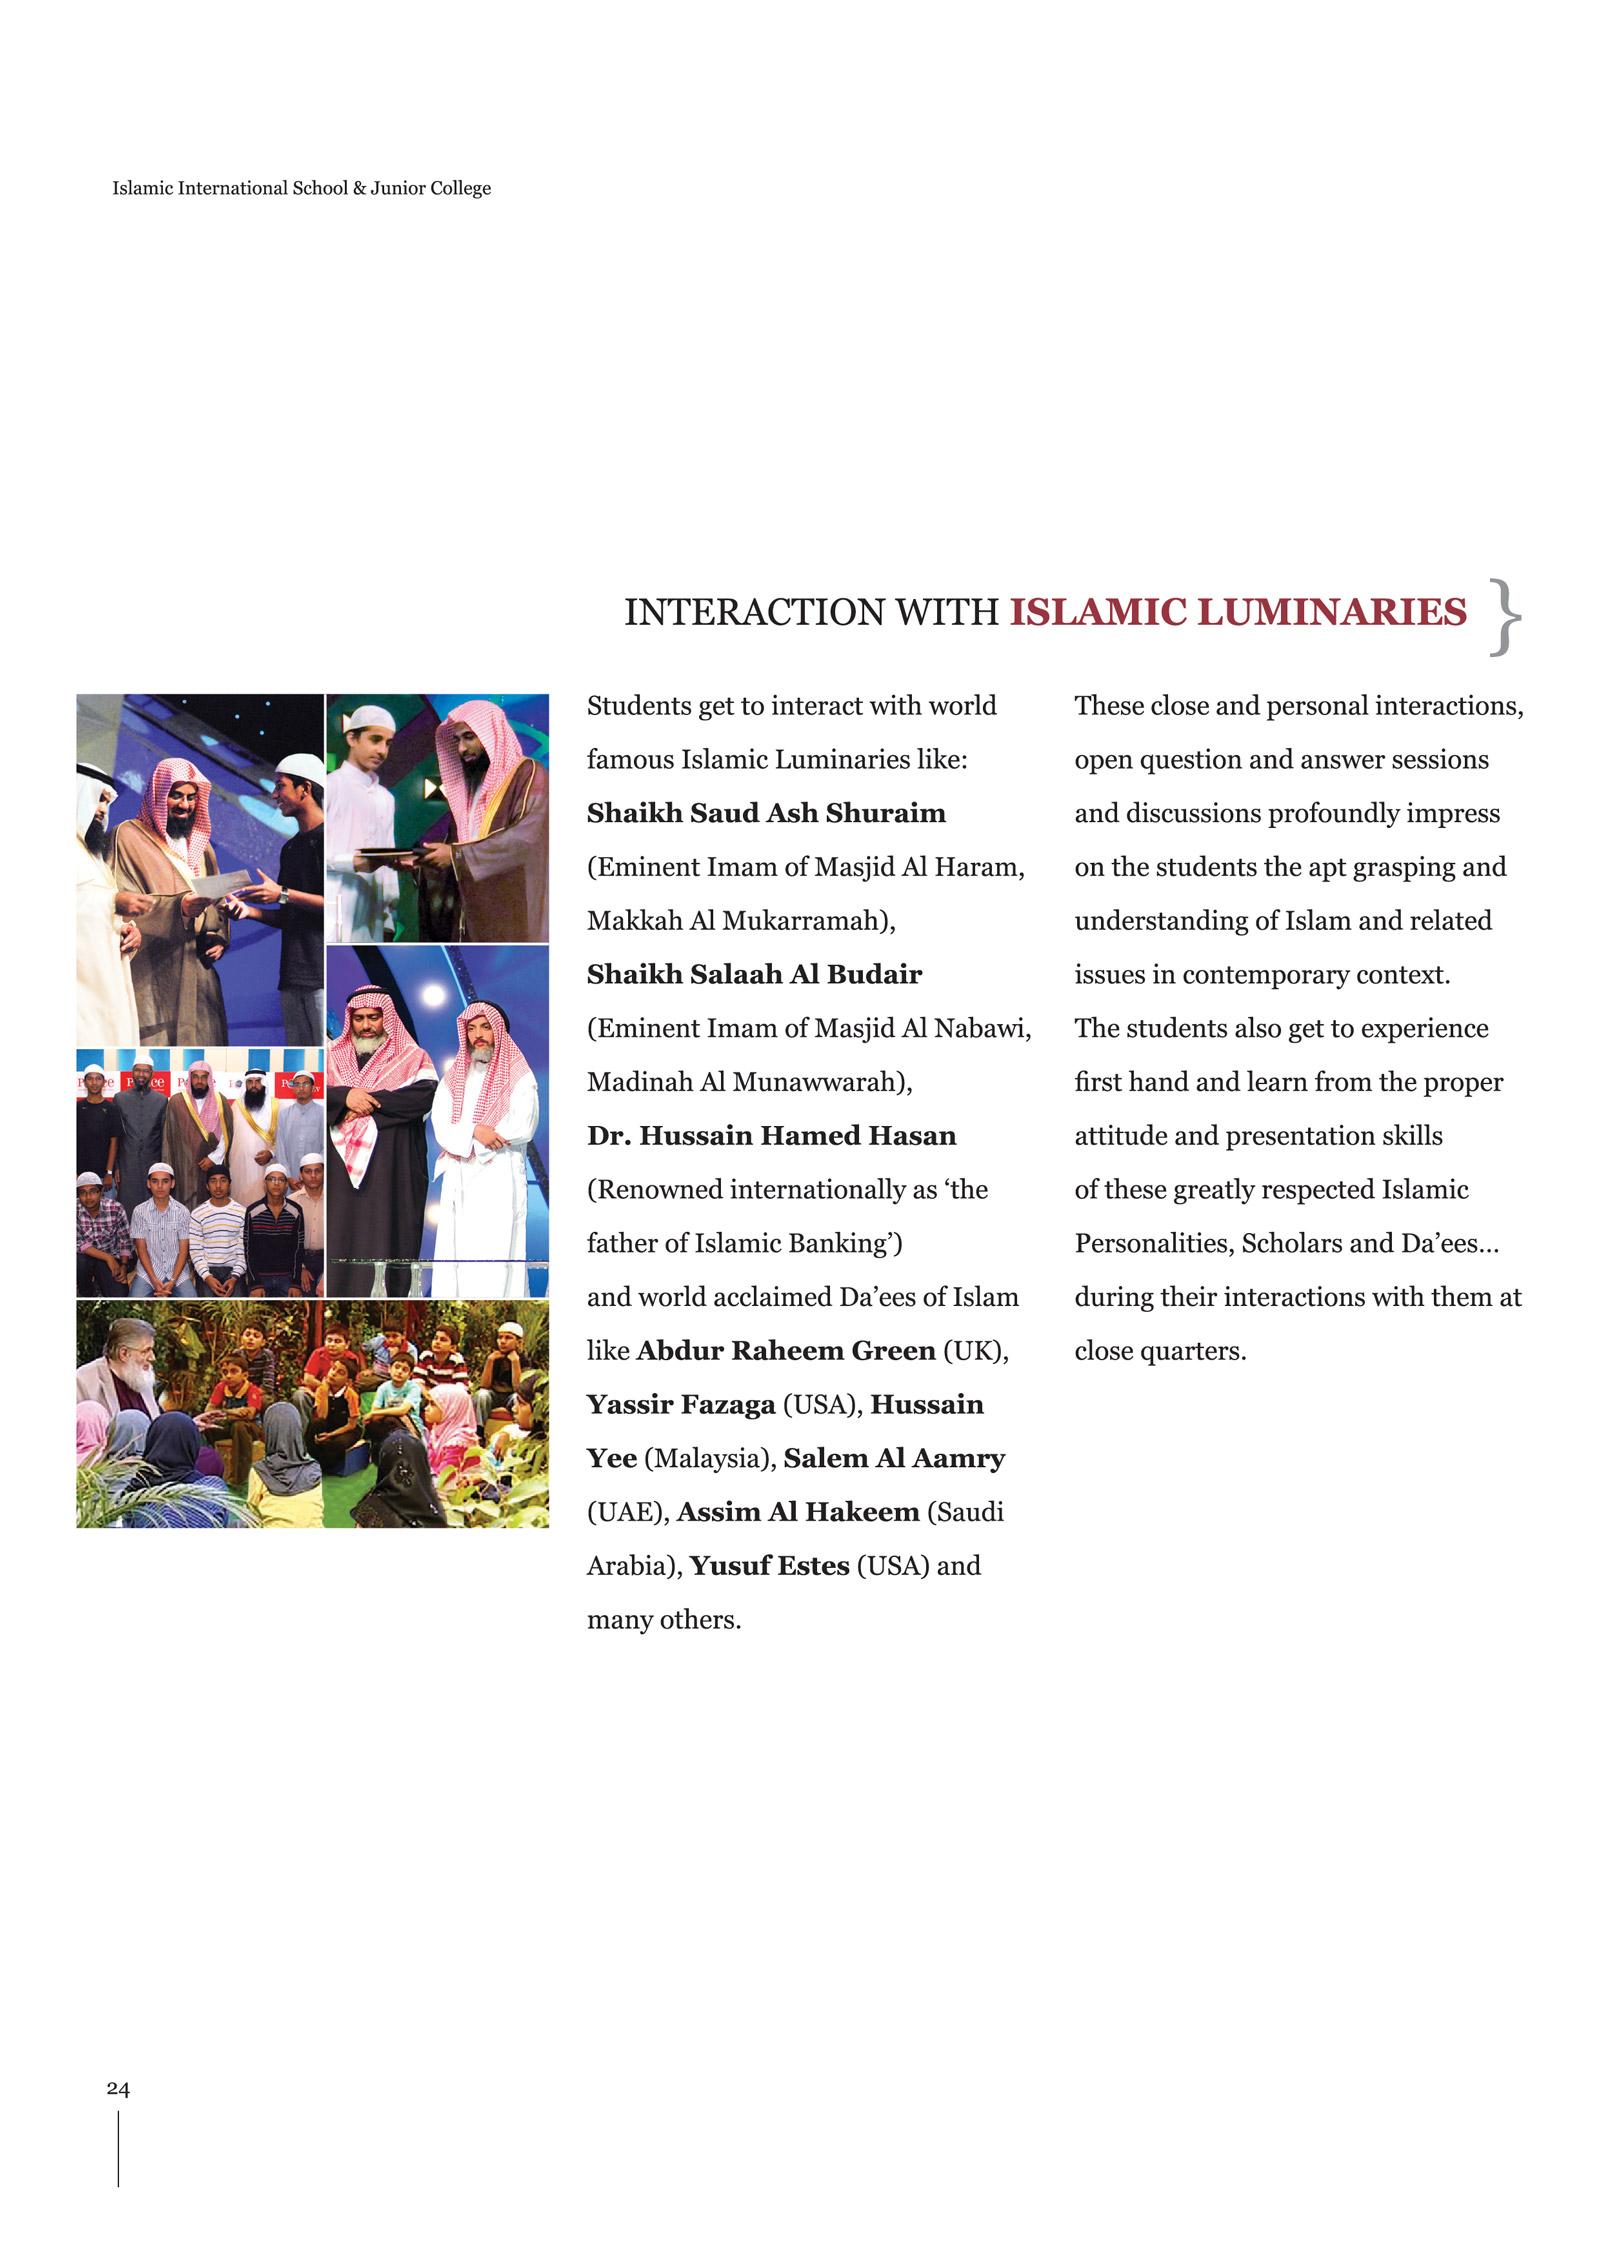 Islamic International School (IIS) & Junior Callege